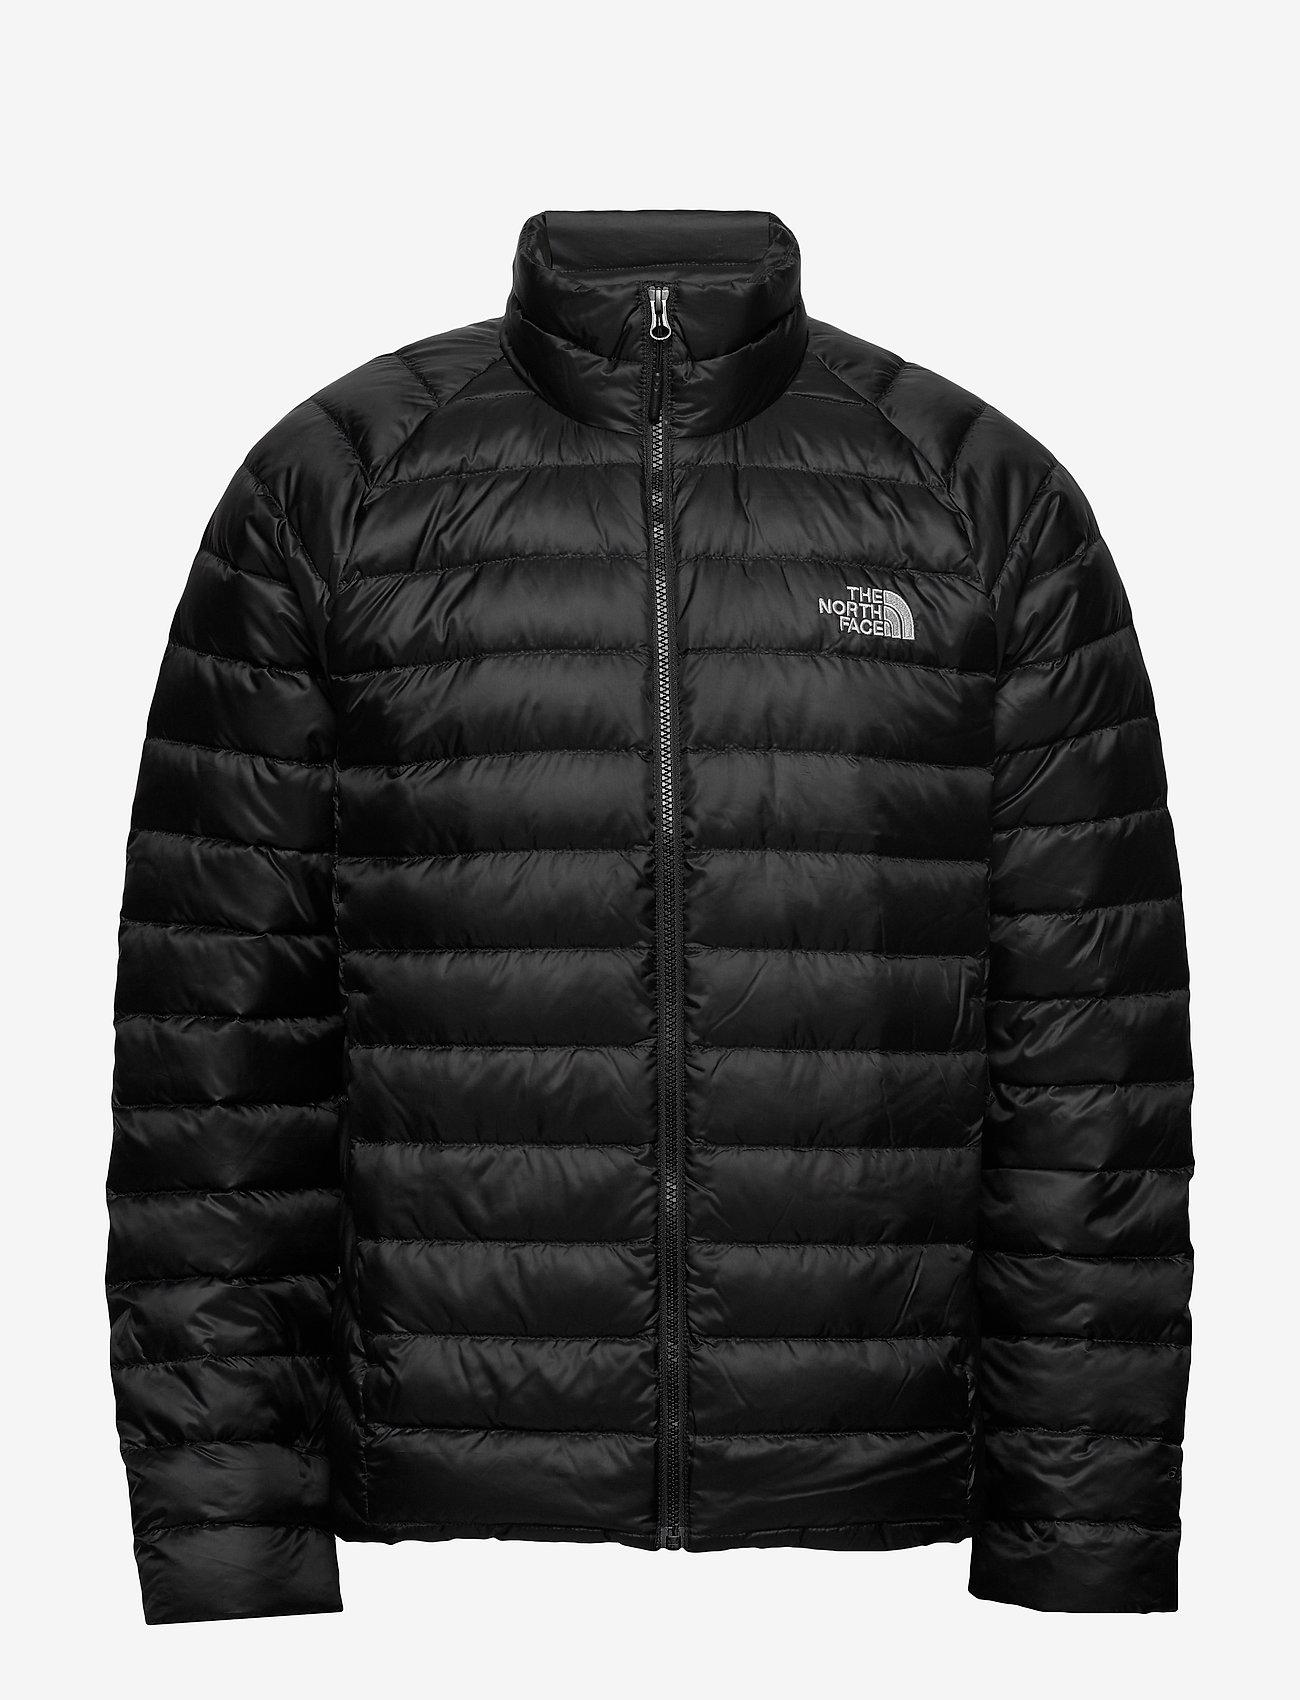 The North Face - M TREVAIL JACKET - vestes matelassées - tnf black-tnf black - 1